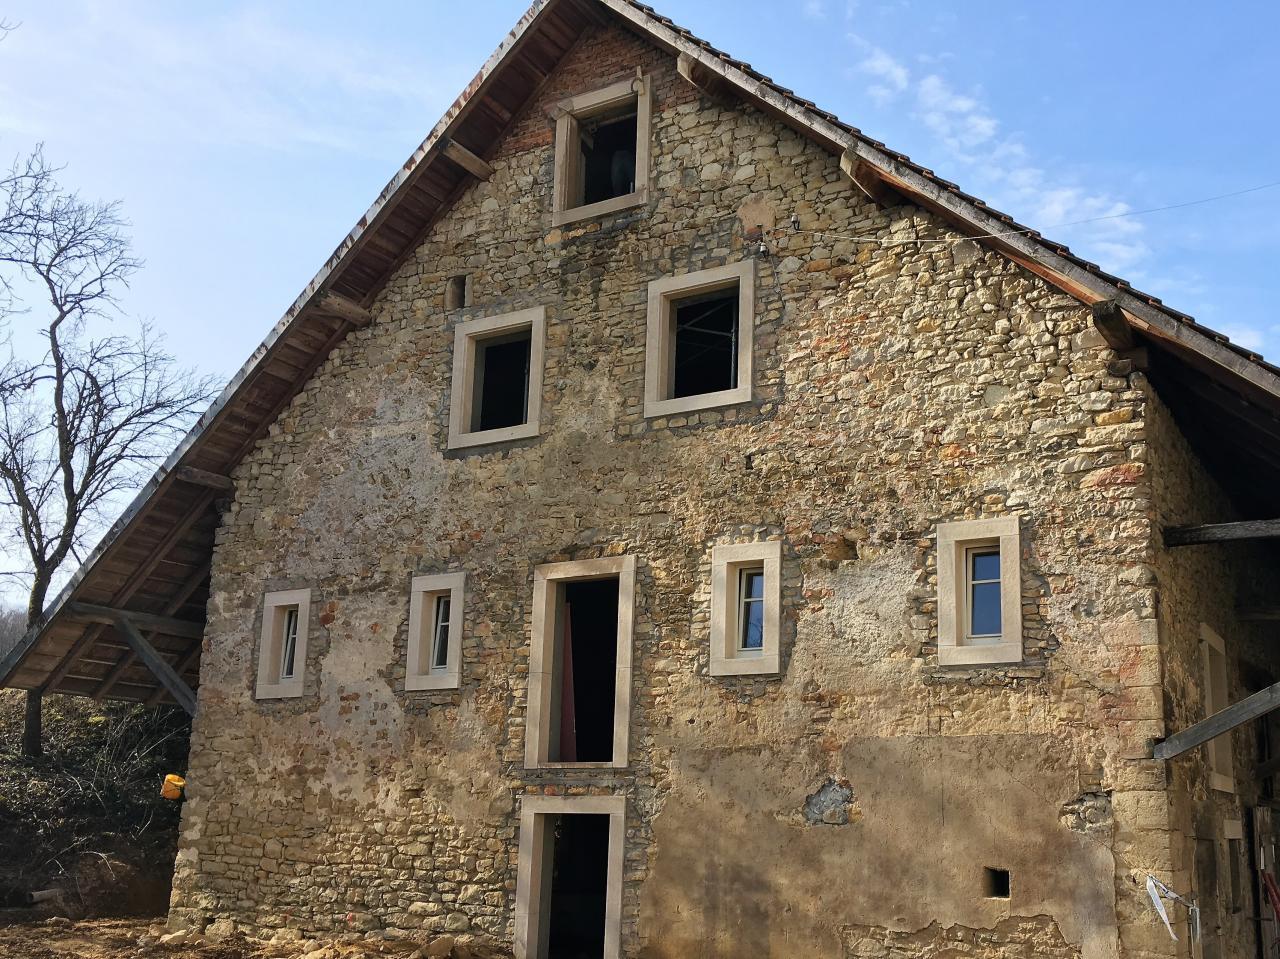 Moulin Courtelevant